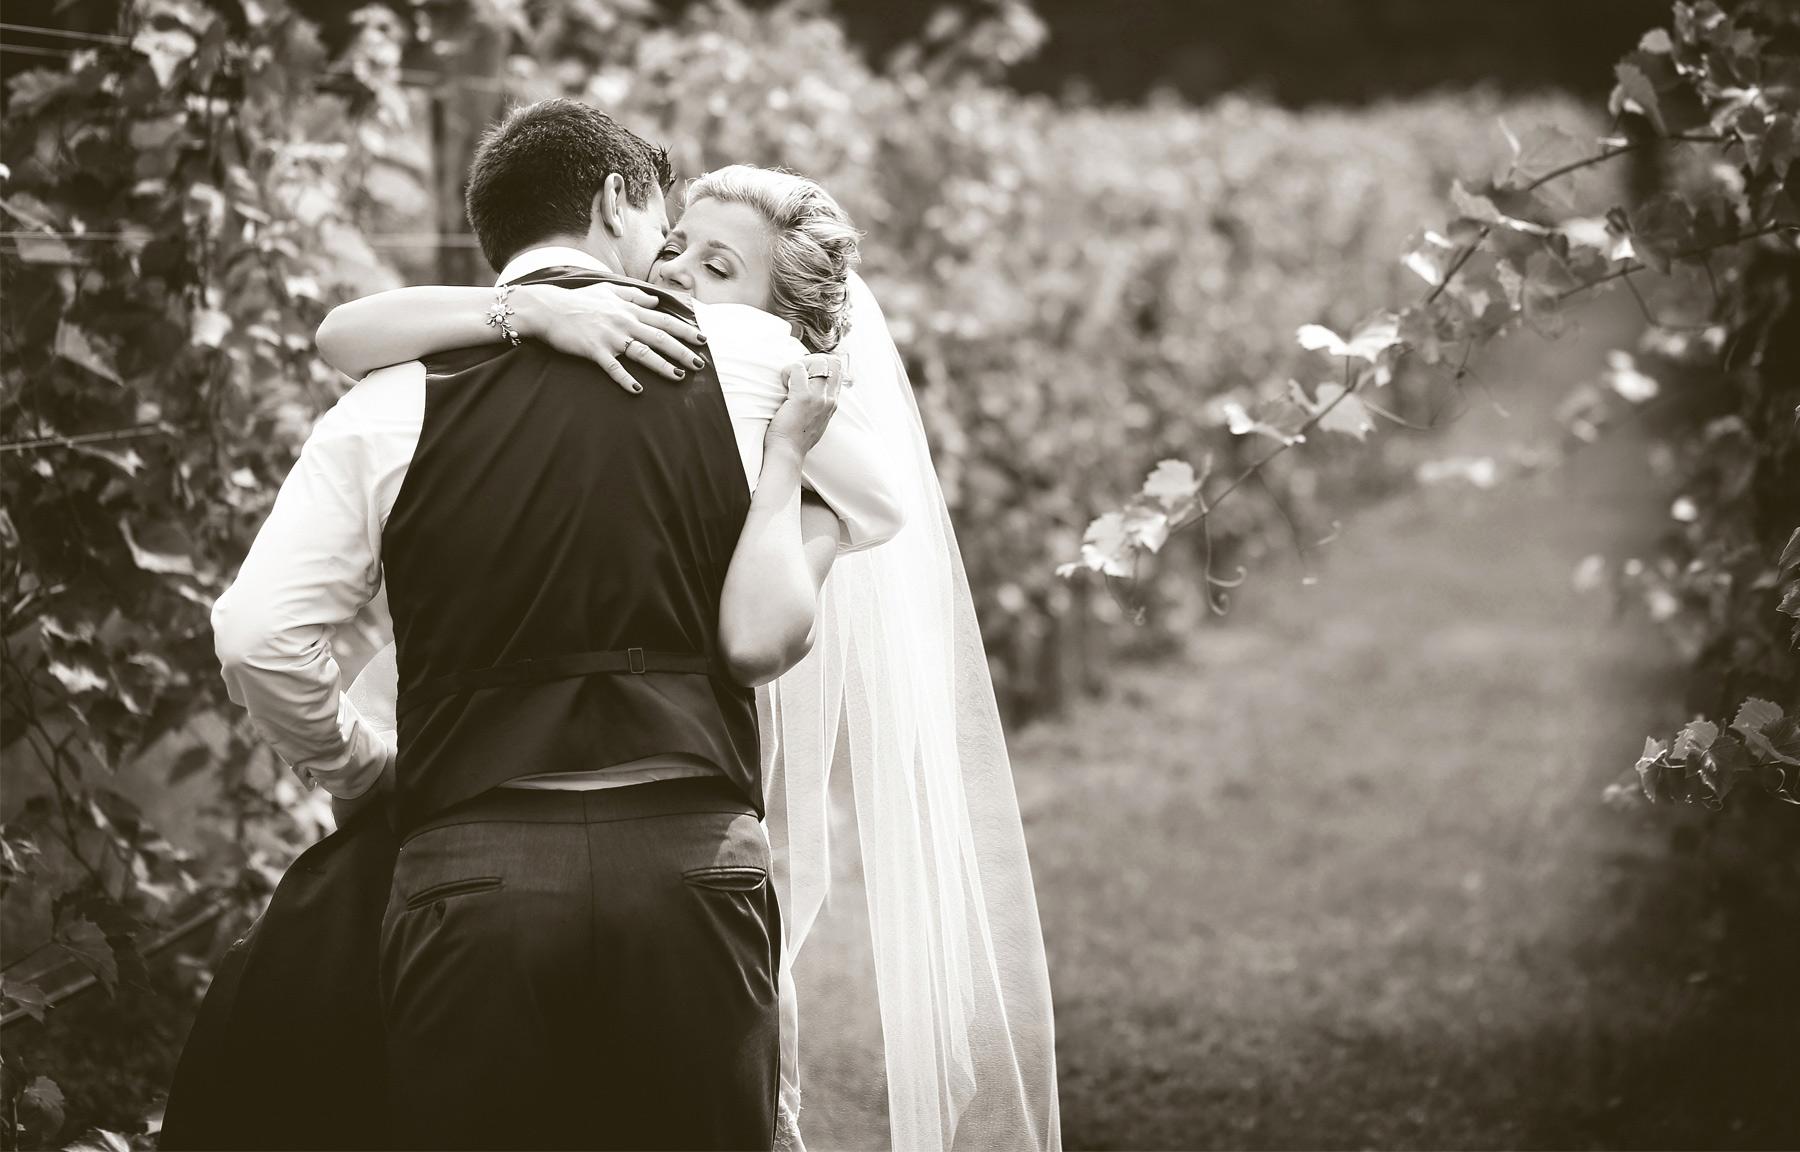 03-Lake-Pepin-Wisconsin-Wedding-Photography-by-Vick-Photography-Villa-Bellezza-Vineyard-Winery-First-Look-Emily-&-Sam.jpg